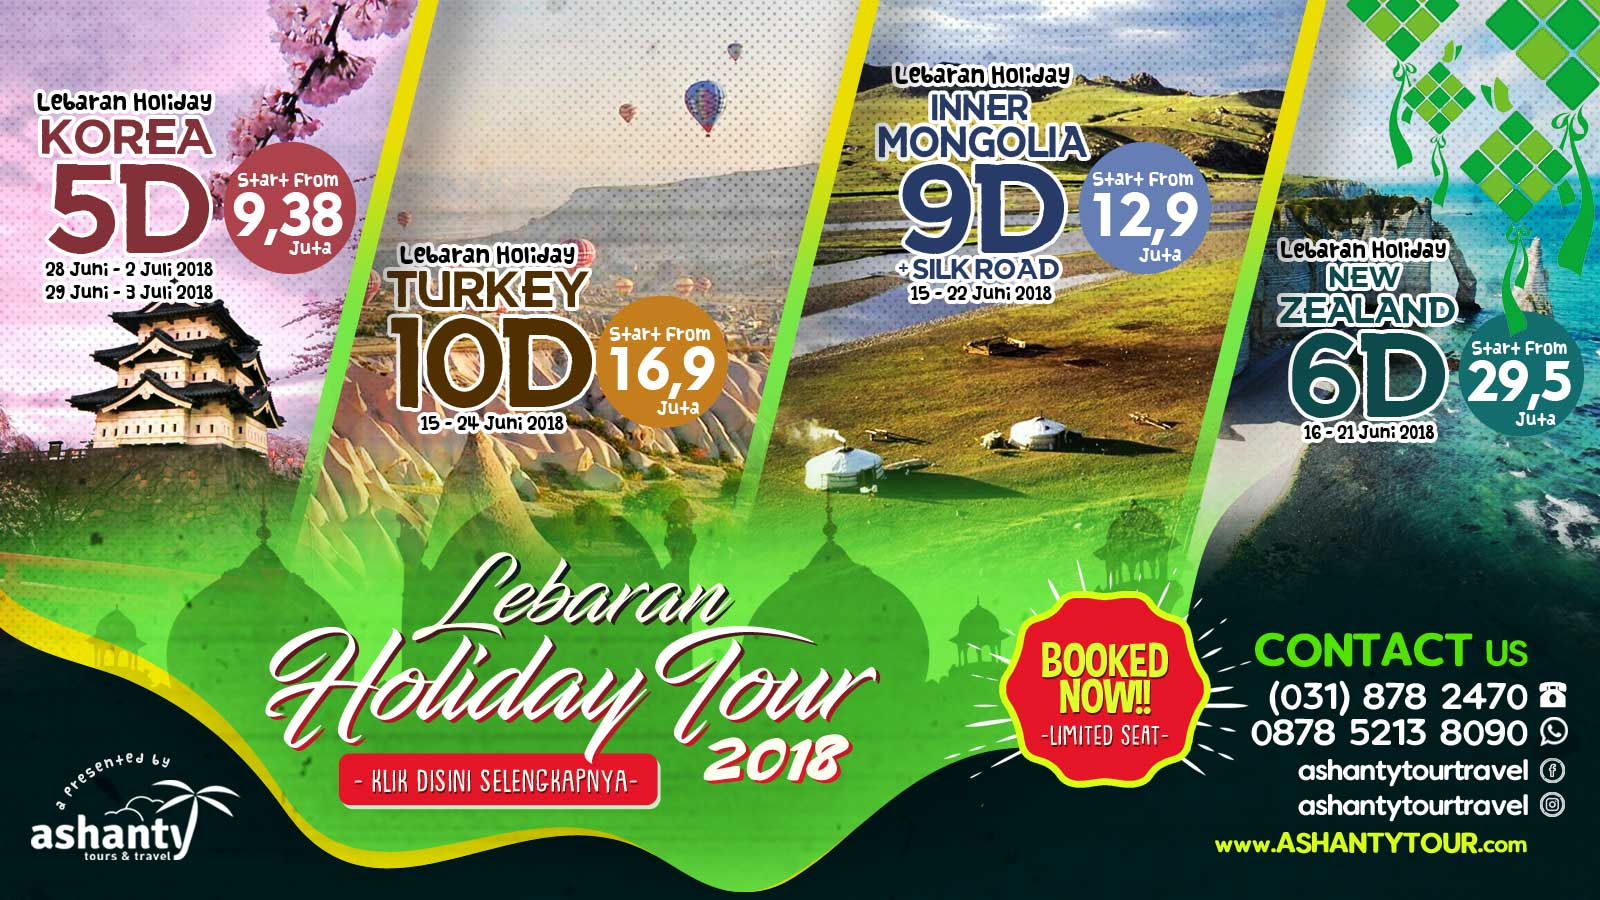 paket wisata liburan lebaran dari surabaya 2018